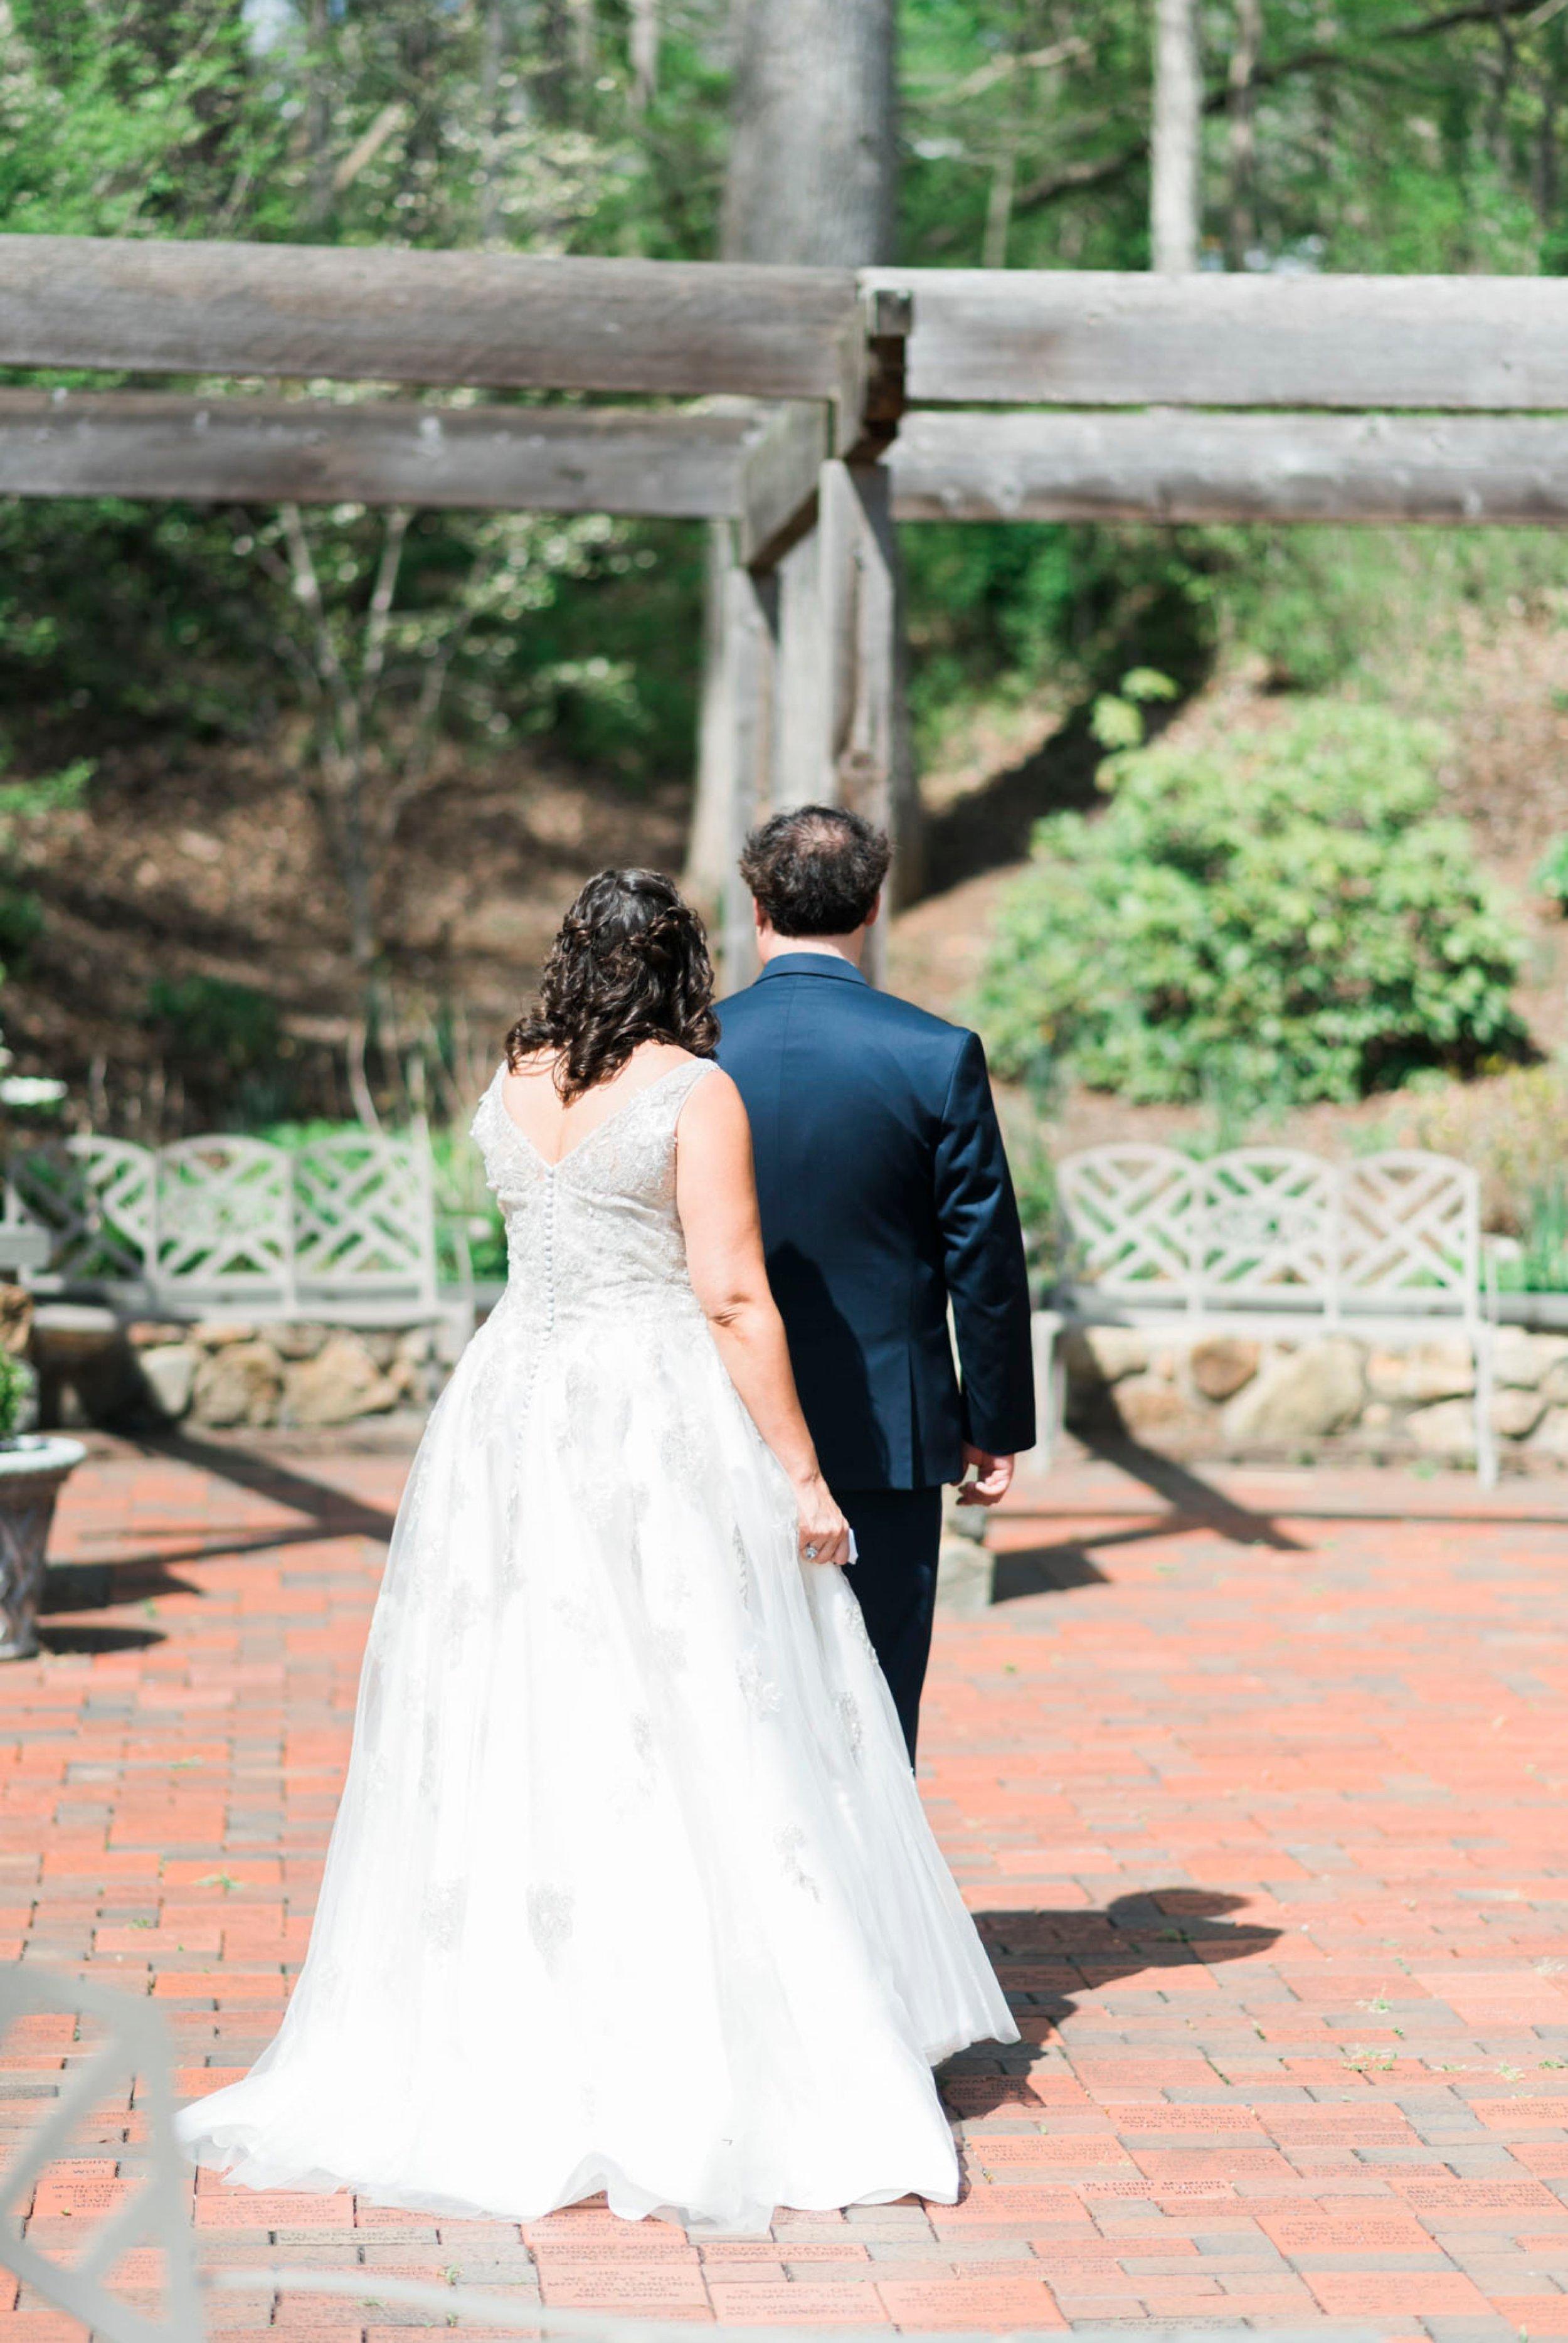 TheVirginianHotel_LynchburgVA_TheVirginianHotelWedding_Virginiaweddingphotographer_Lynchburgvawedding 17.jpg